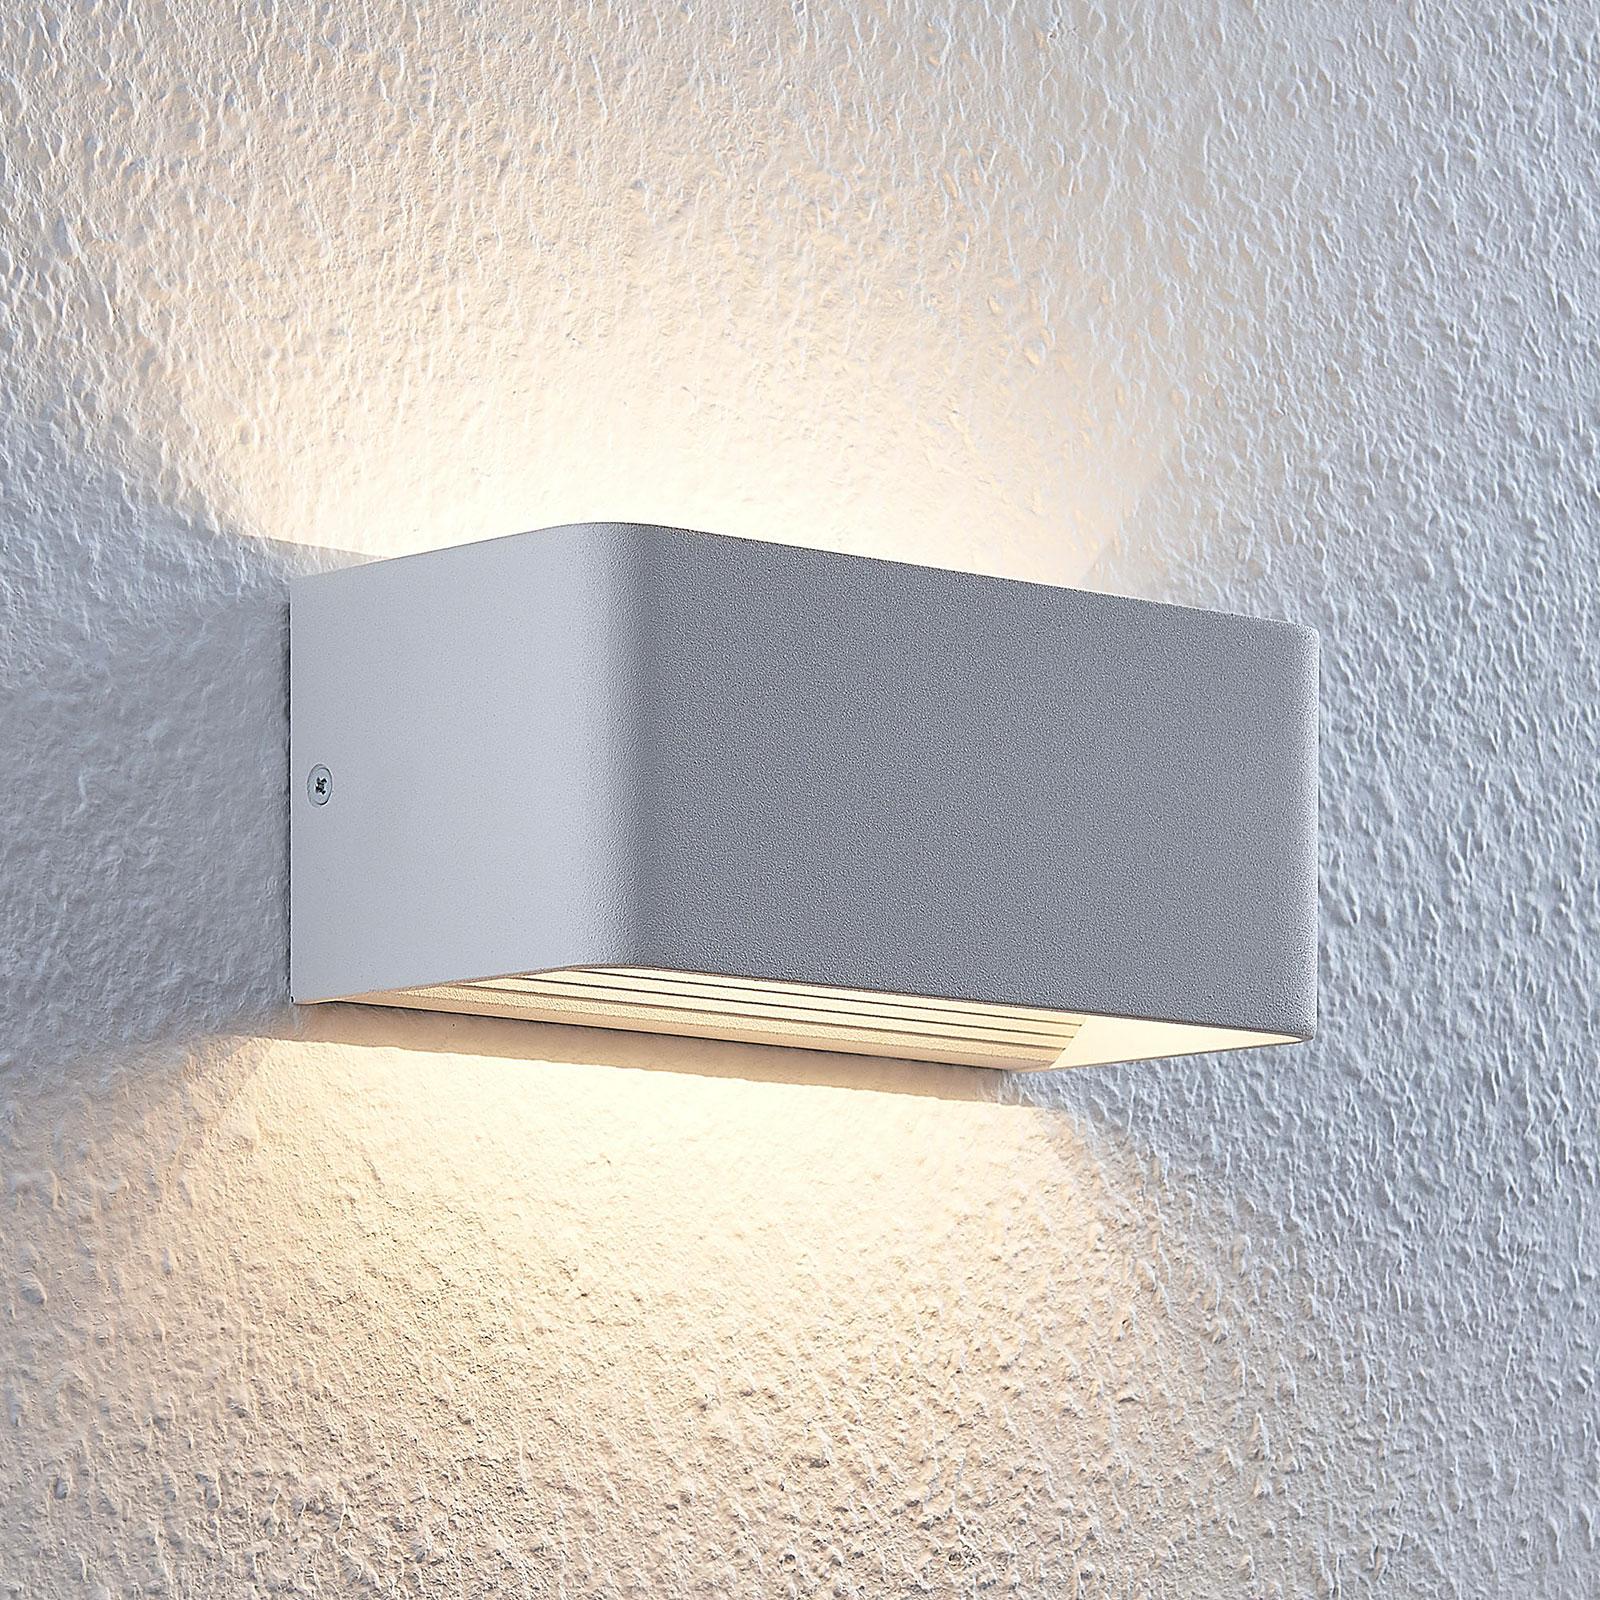 LED-Wandleuchte Lonisa, weiß, 20 cm